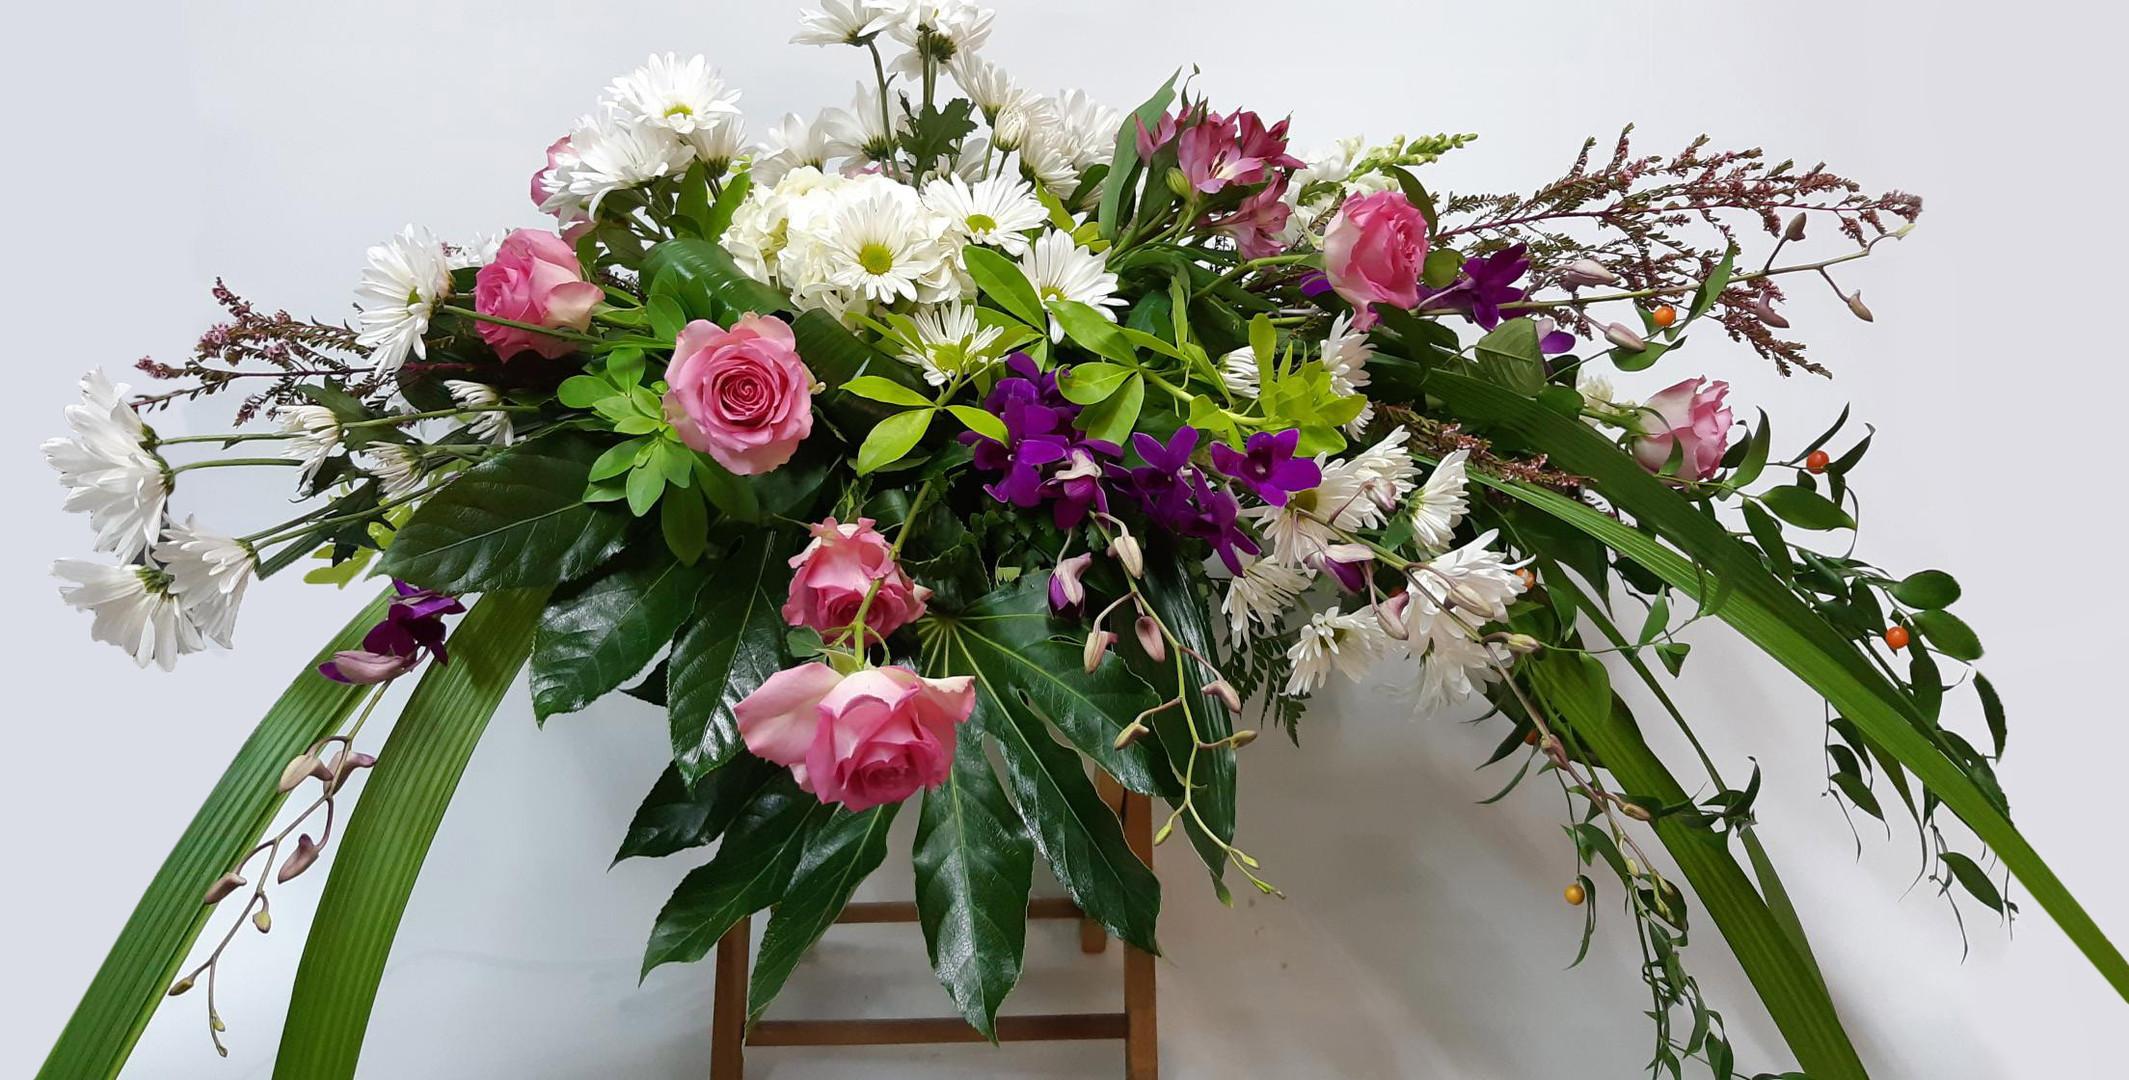 Arrangement cercueil 2